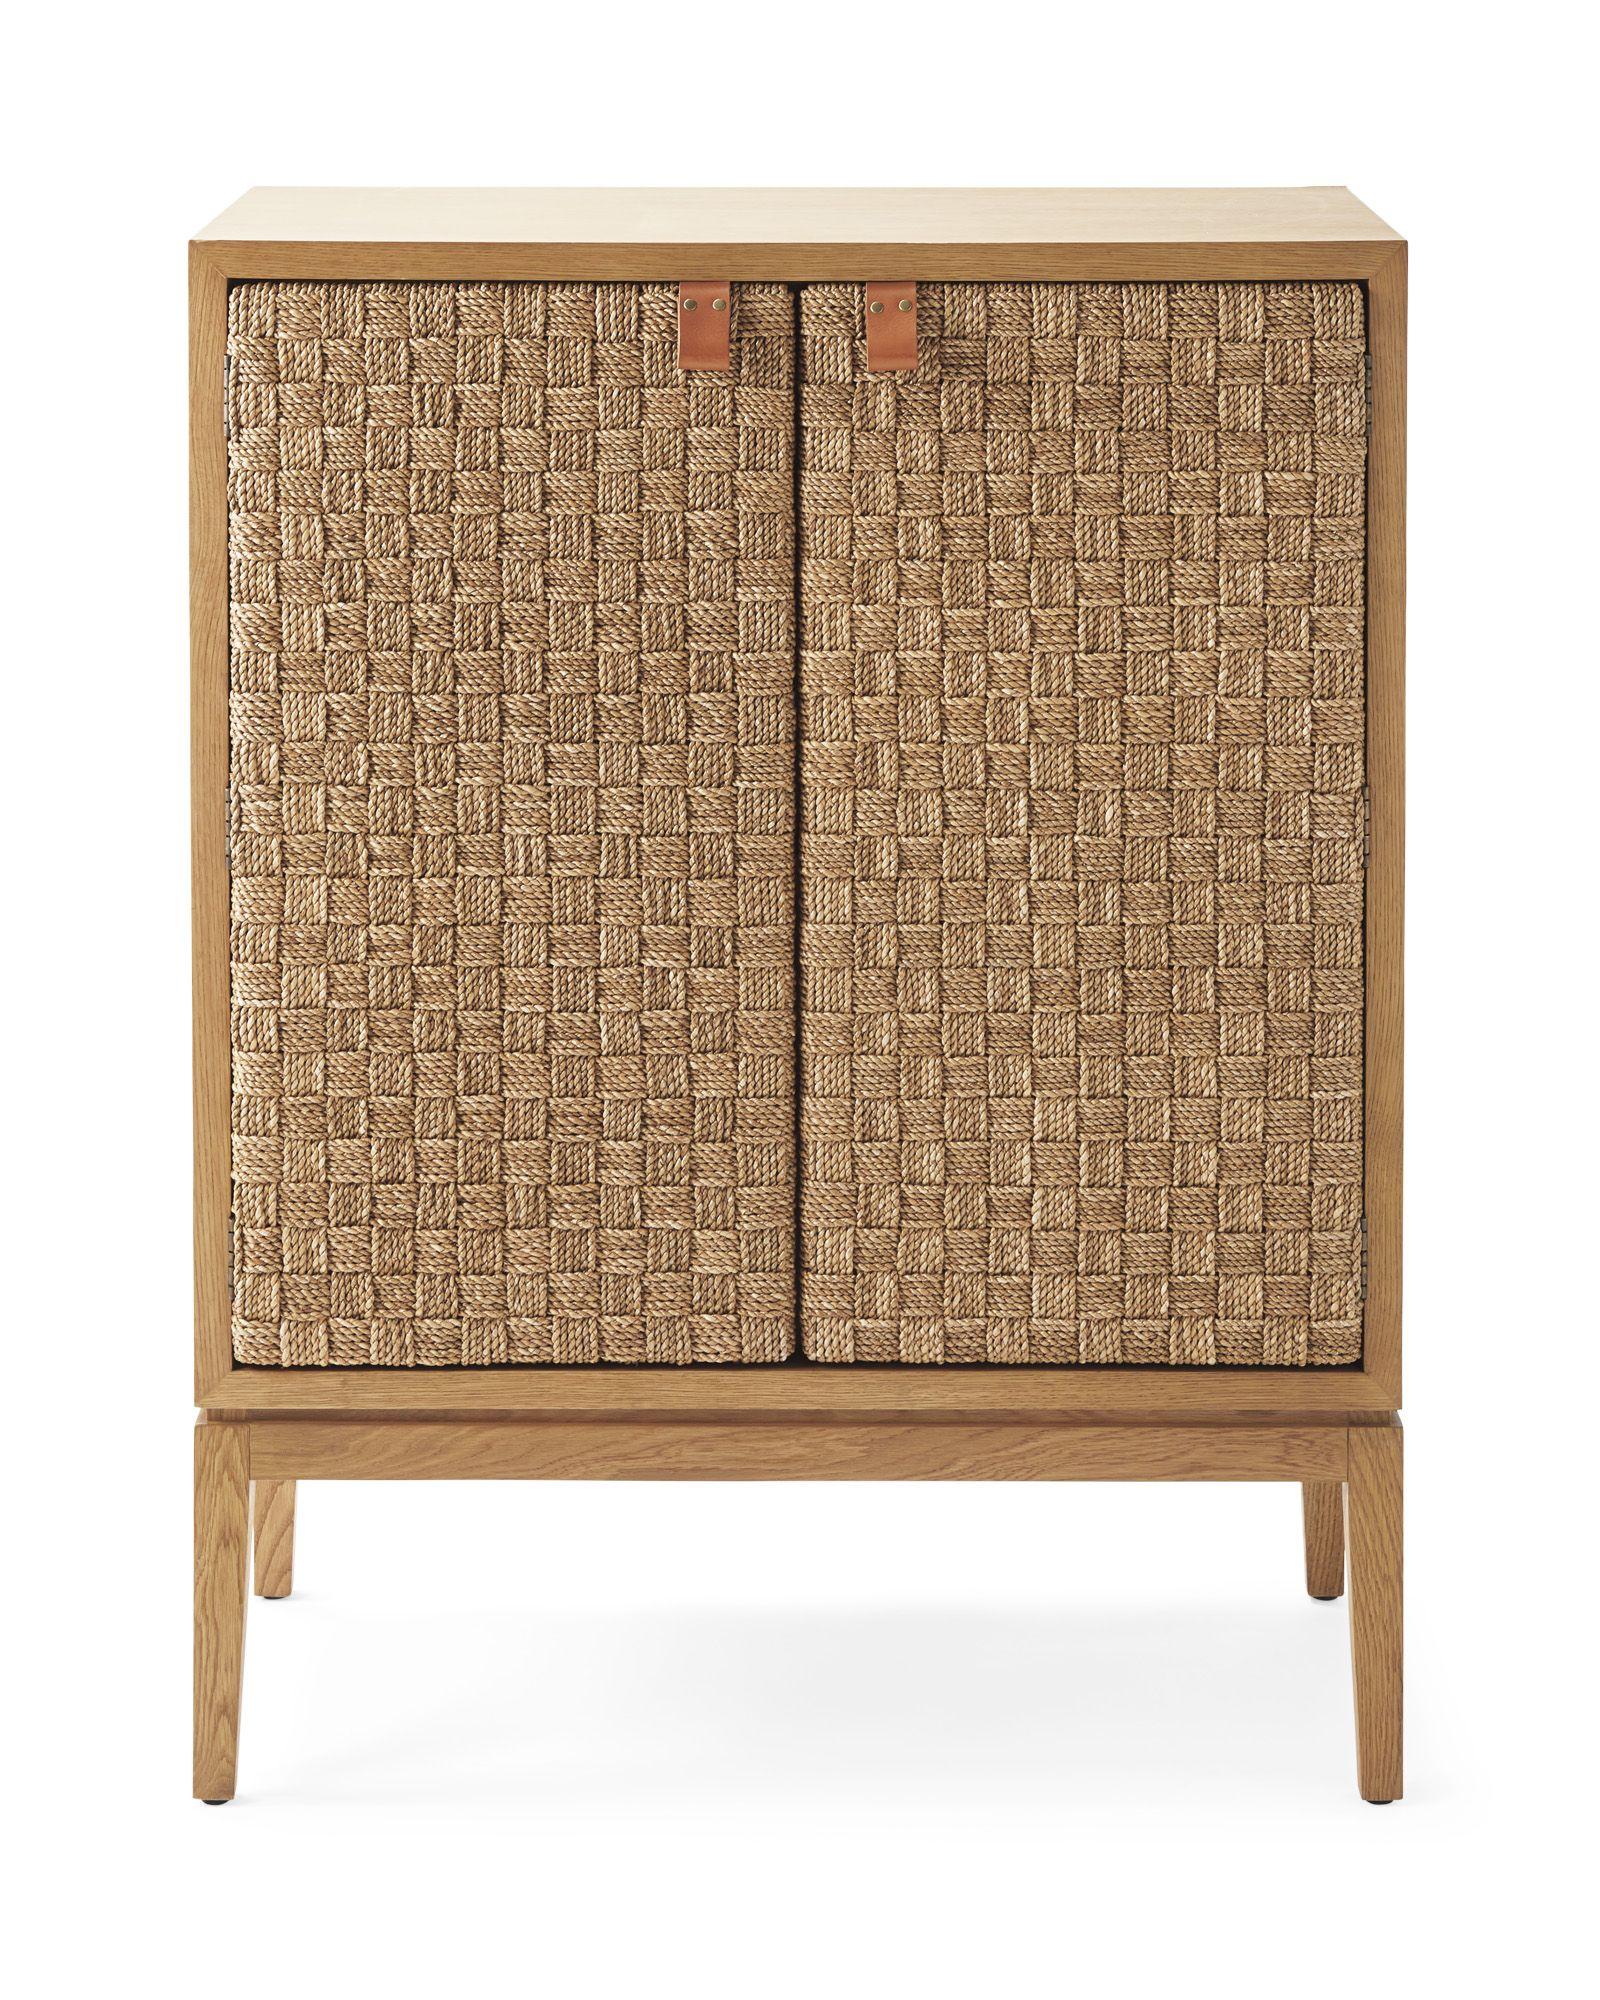 Phenomenal Inexpensive Furniture Uk Download Free Architecture Designs Intelgarnamadebymaigaardcom